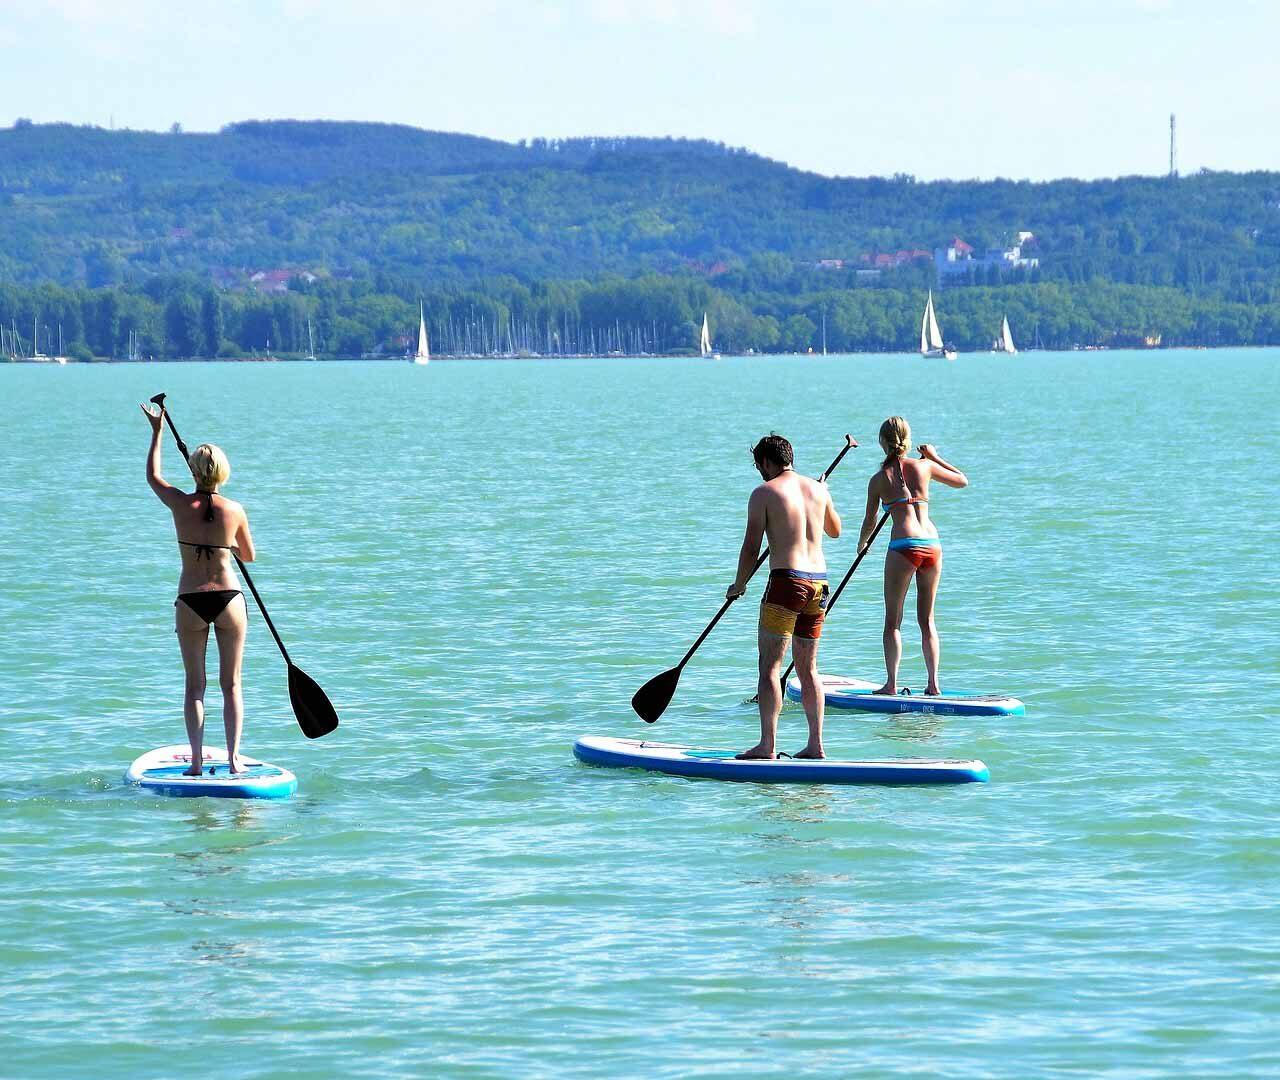 stand-up-paddle-noleggio-sup-monopoli-seaward2